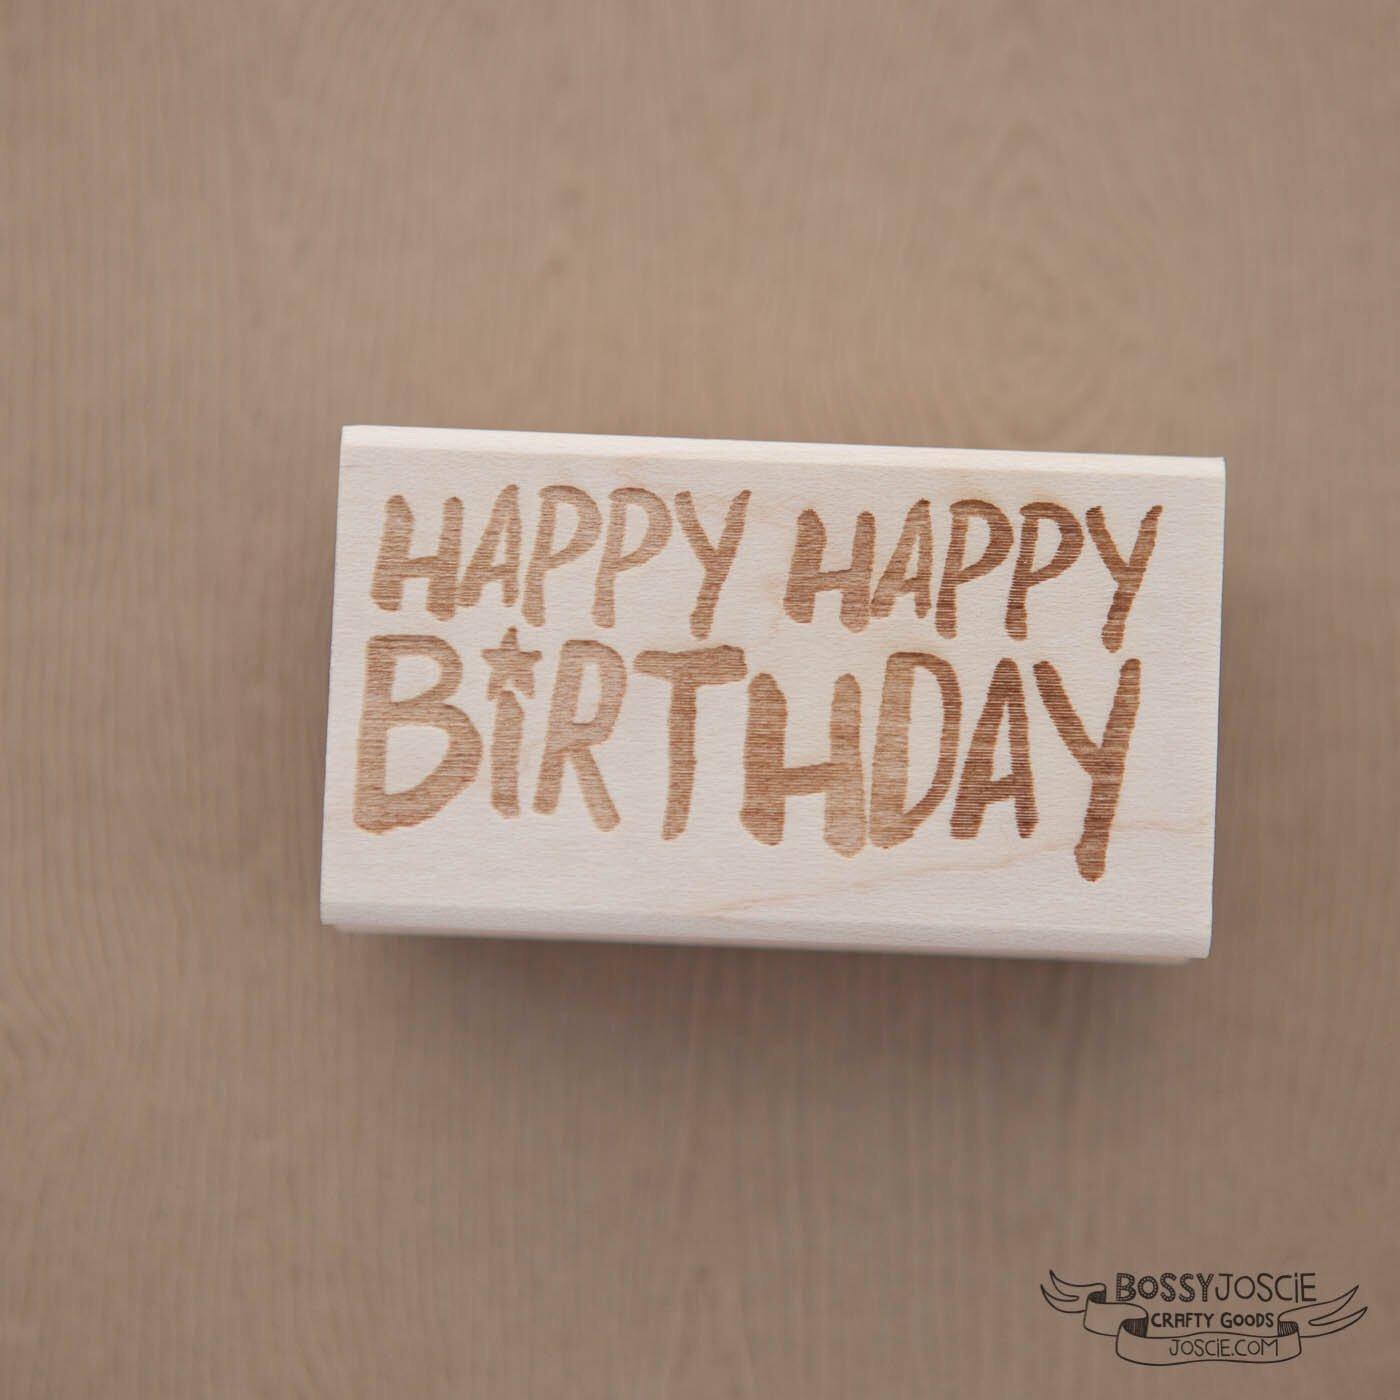 Image of Happy Happy Birthday Brush stamp